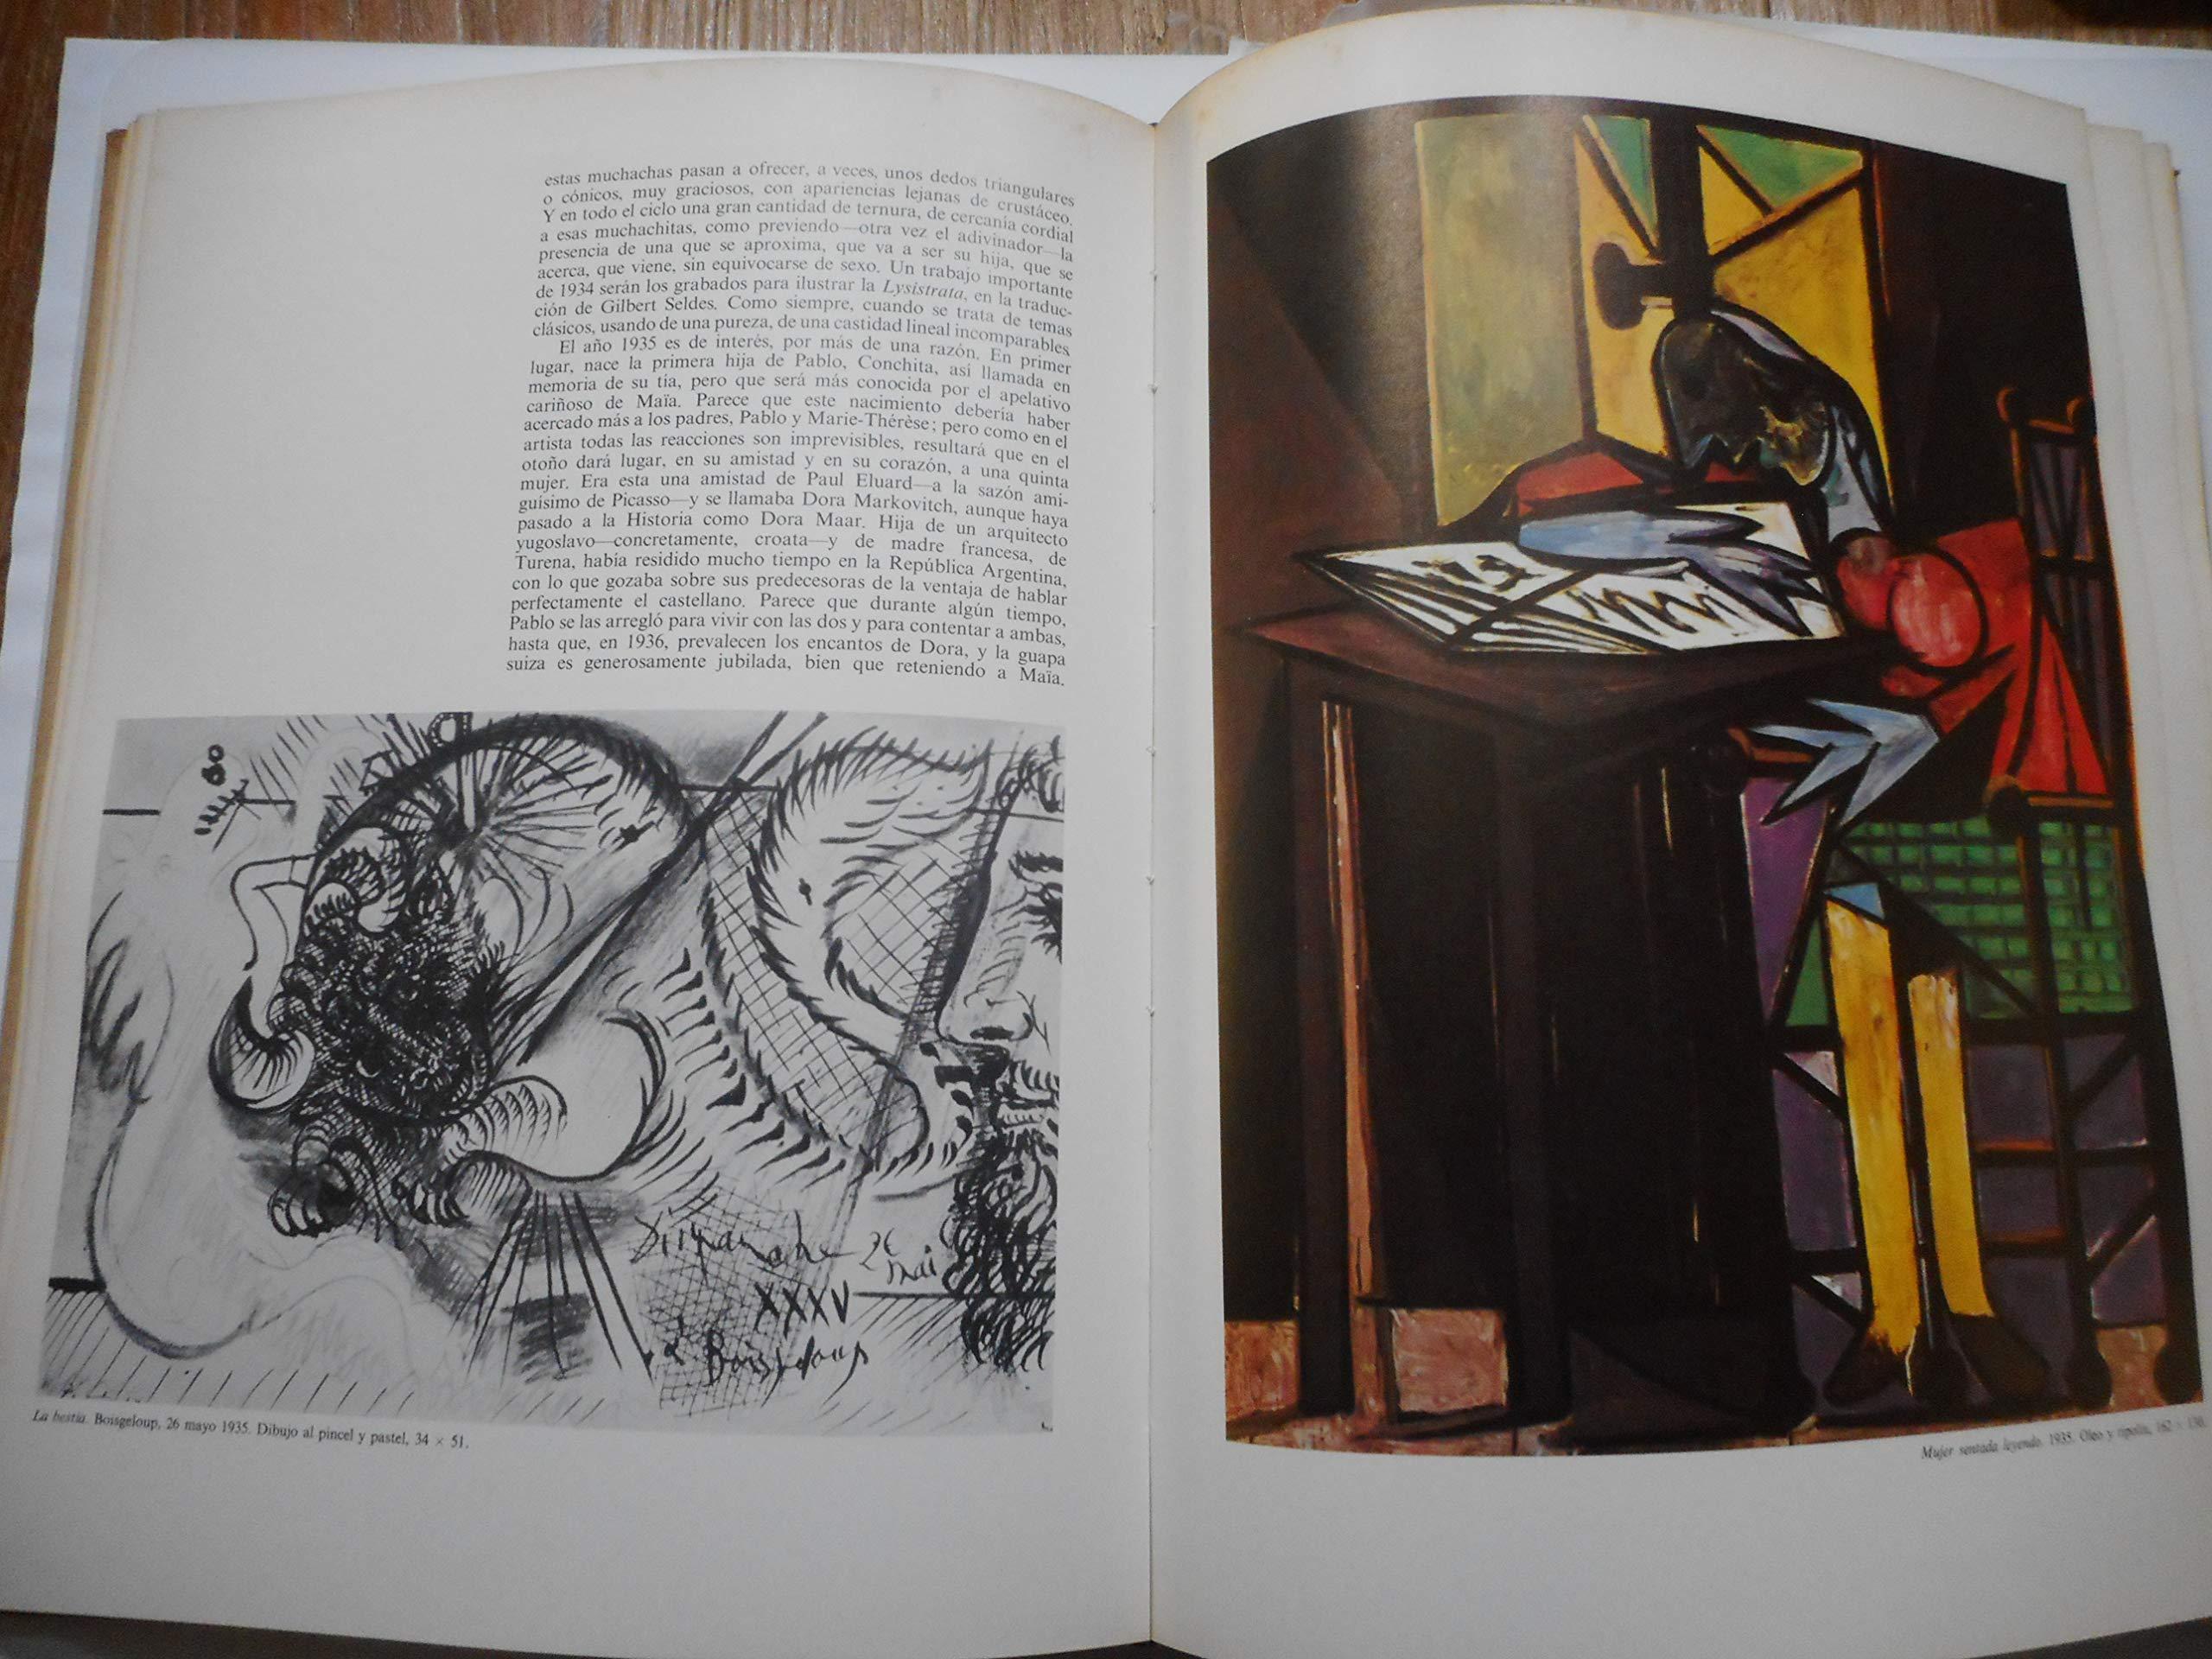 Amazon.com: Picasso Librofilm Collection Aguilar Fotos ...